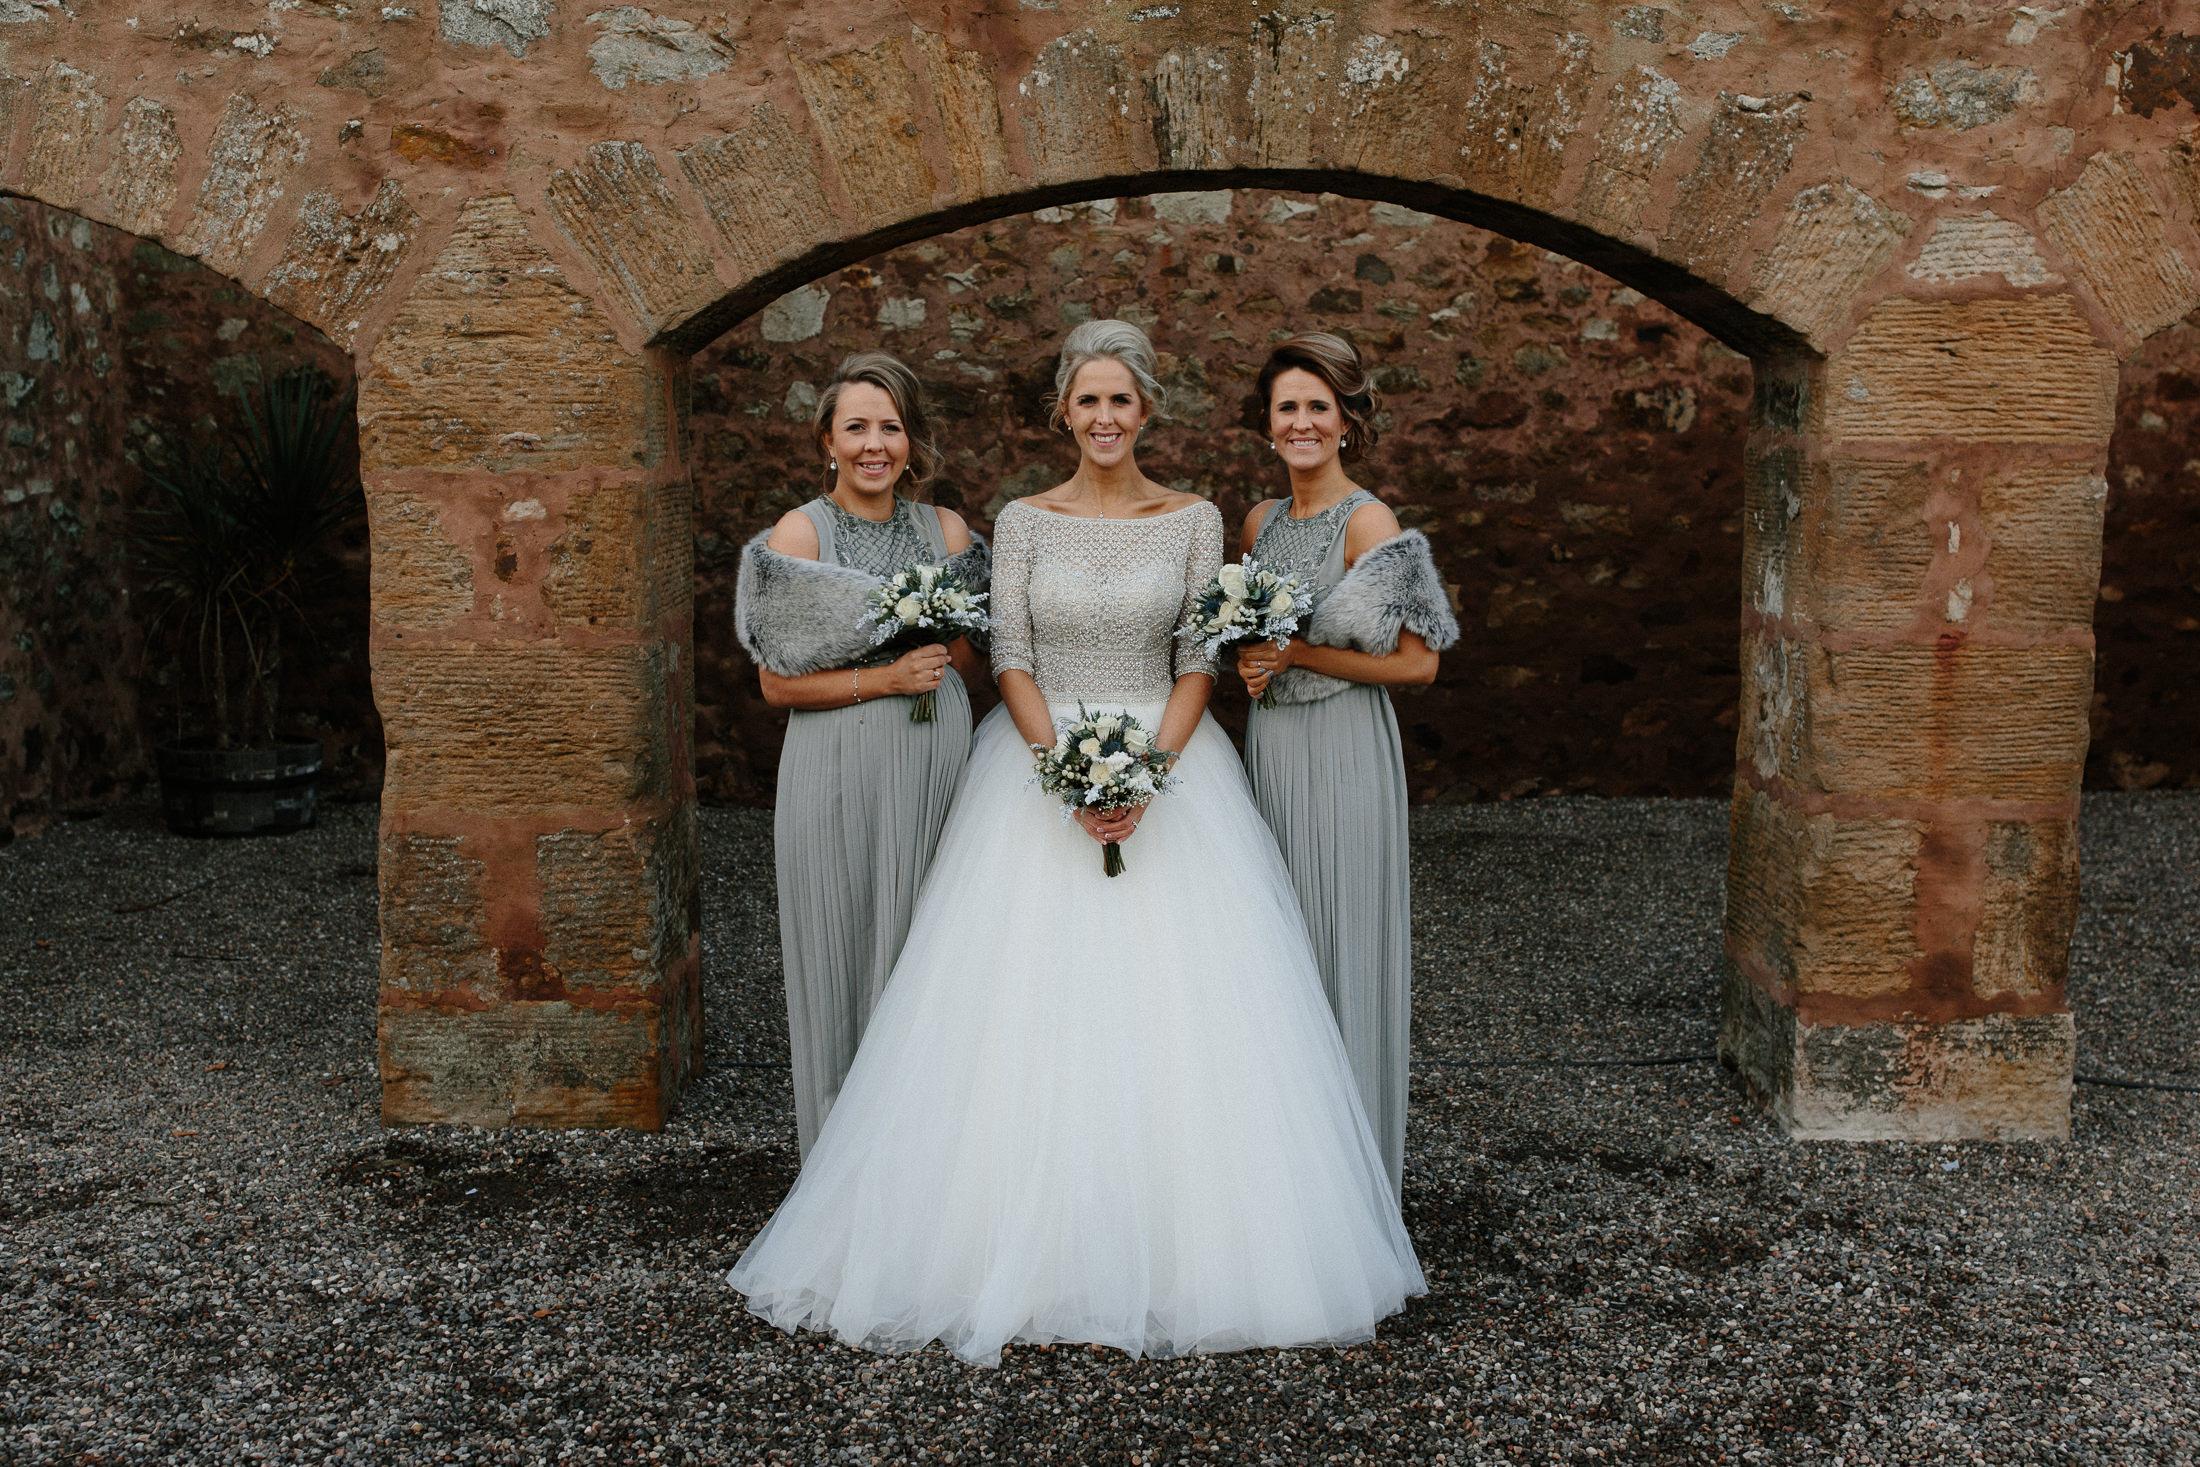 Kayleigh-Michael-Cow-Shed-Cowshed-Crail-Fife-Coastal-Rustic-Barn-Lianne-Mackay-Wedding-Photography-Photographer-Edinburgh-Glasgow-Scotland-WEB-RES-472.jpg